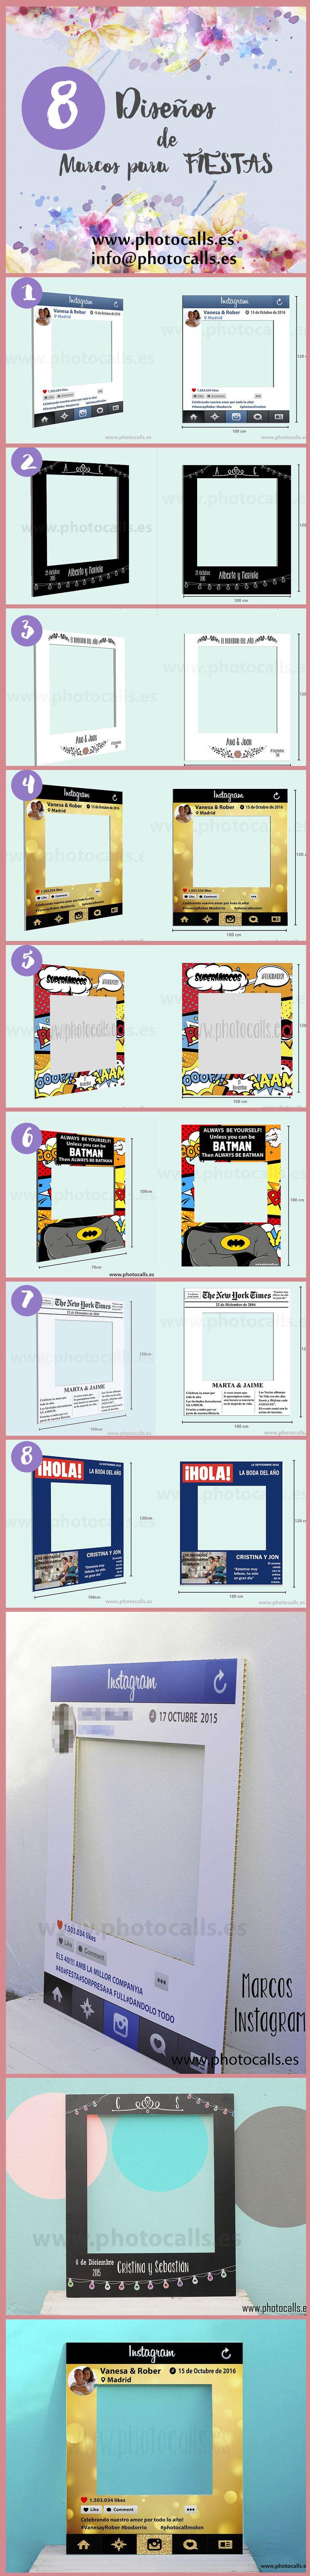 8 Diseños marco polaroid personalizables para tu fiestas .Photocal para boda. Elige tu diseño para #photocall, #photobooth, #Boda, #Cumpleaños, #Despedidas, etc.. info@photocalls.es www.photocalls.es